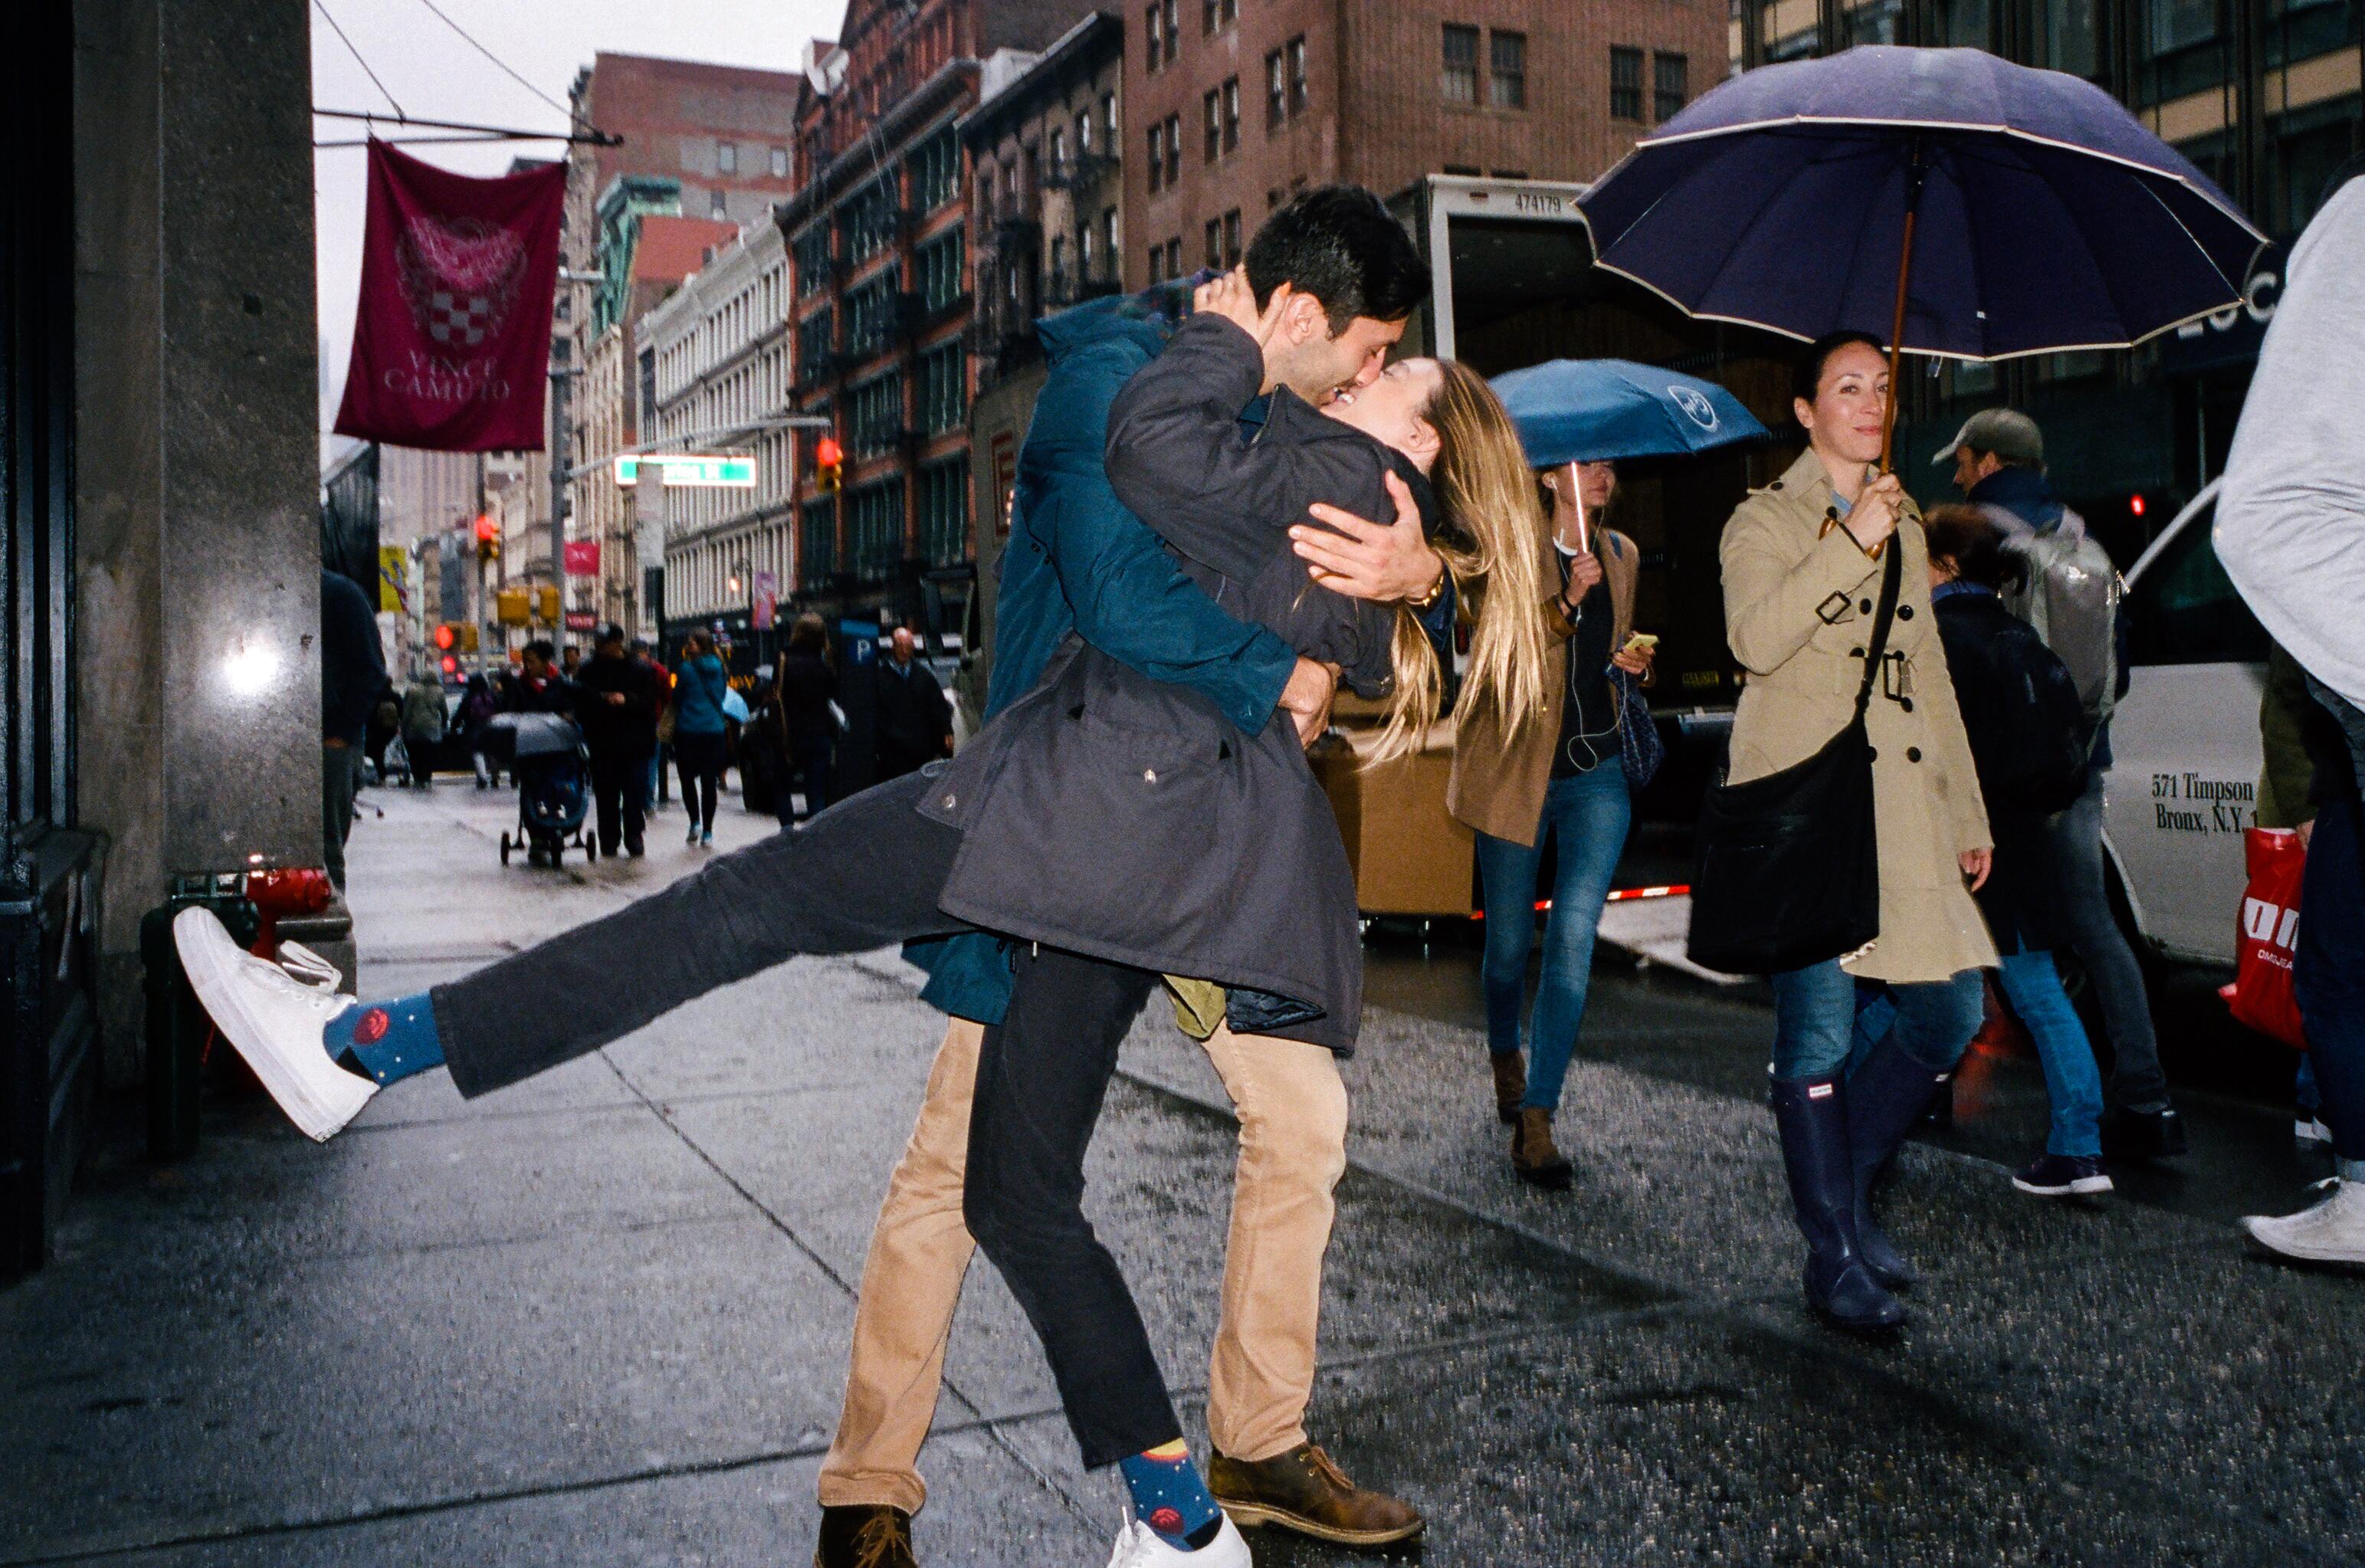 laura-perlongo-and-nev-schulman-kiss-in-the-rain